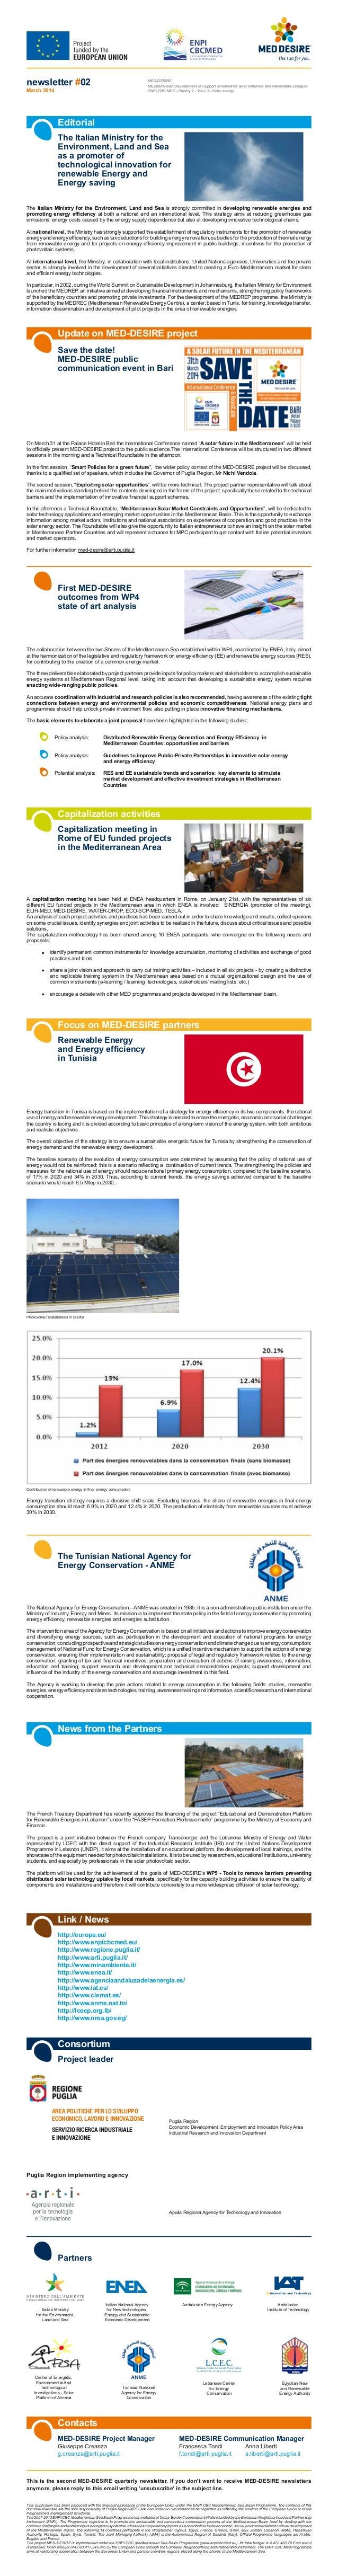 newsletter #02 March 2014 MED-DESIRE MEDiterranean DEvelopment of Support schemes for solar Initiatives and Renewable Ener...